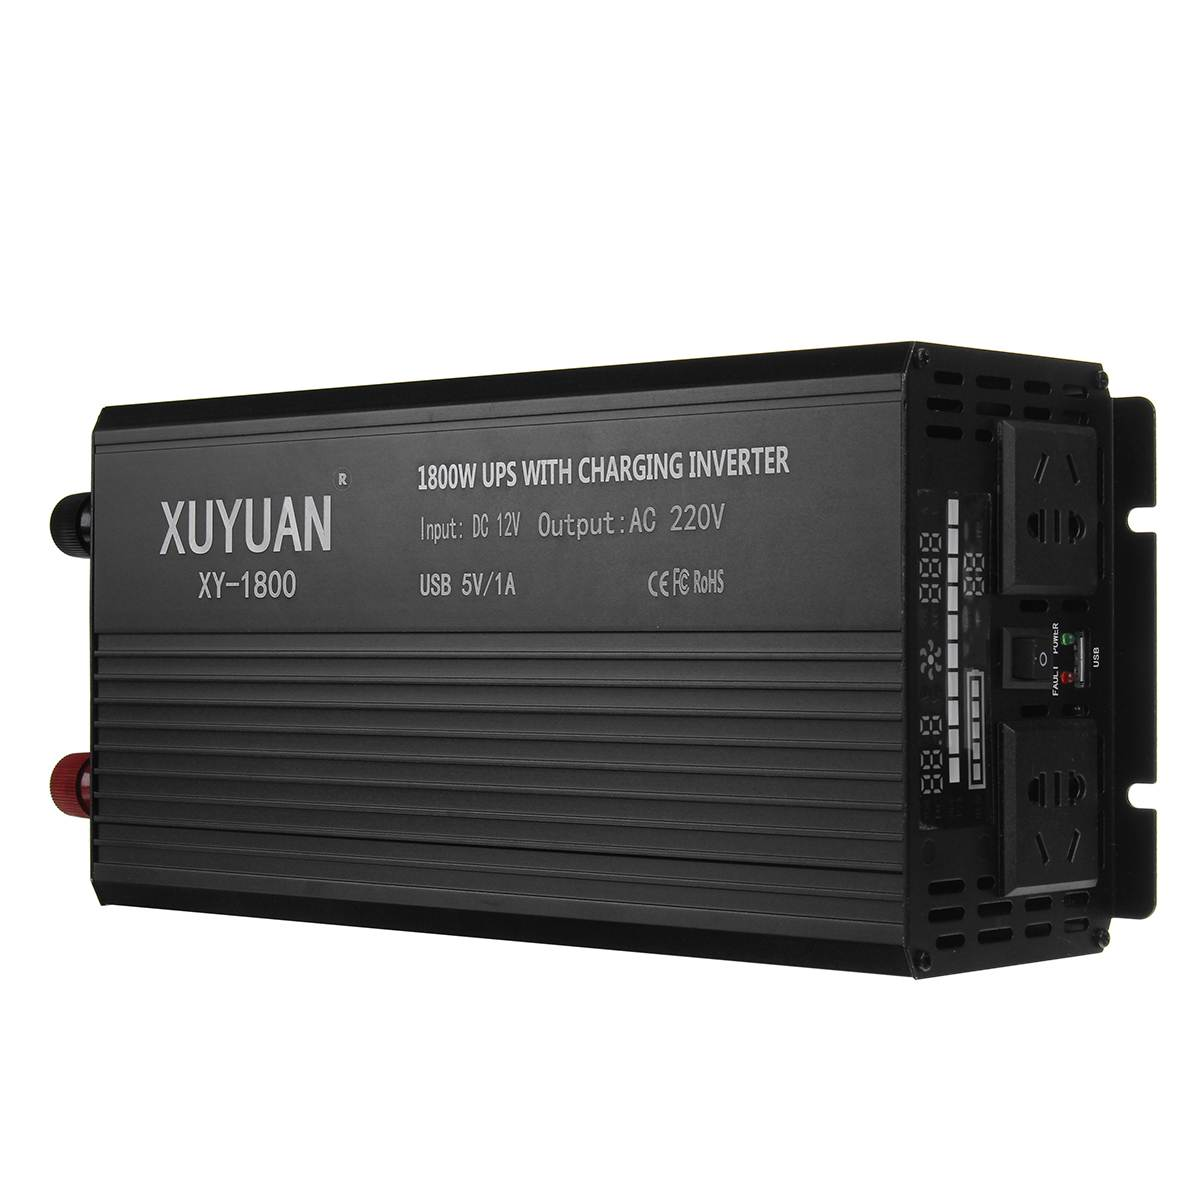 Inverter 12V 220V 3000/4000/5000W P eak UPS Modified Sine Wave LCD Display Grid 12V to 220V Solar Power Inverter for car truck